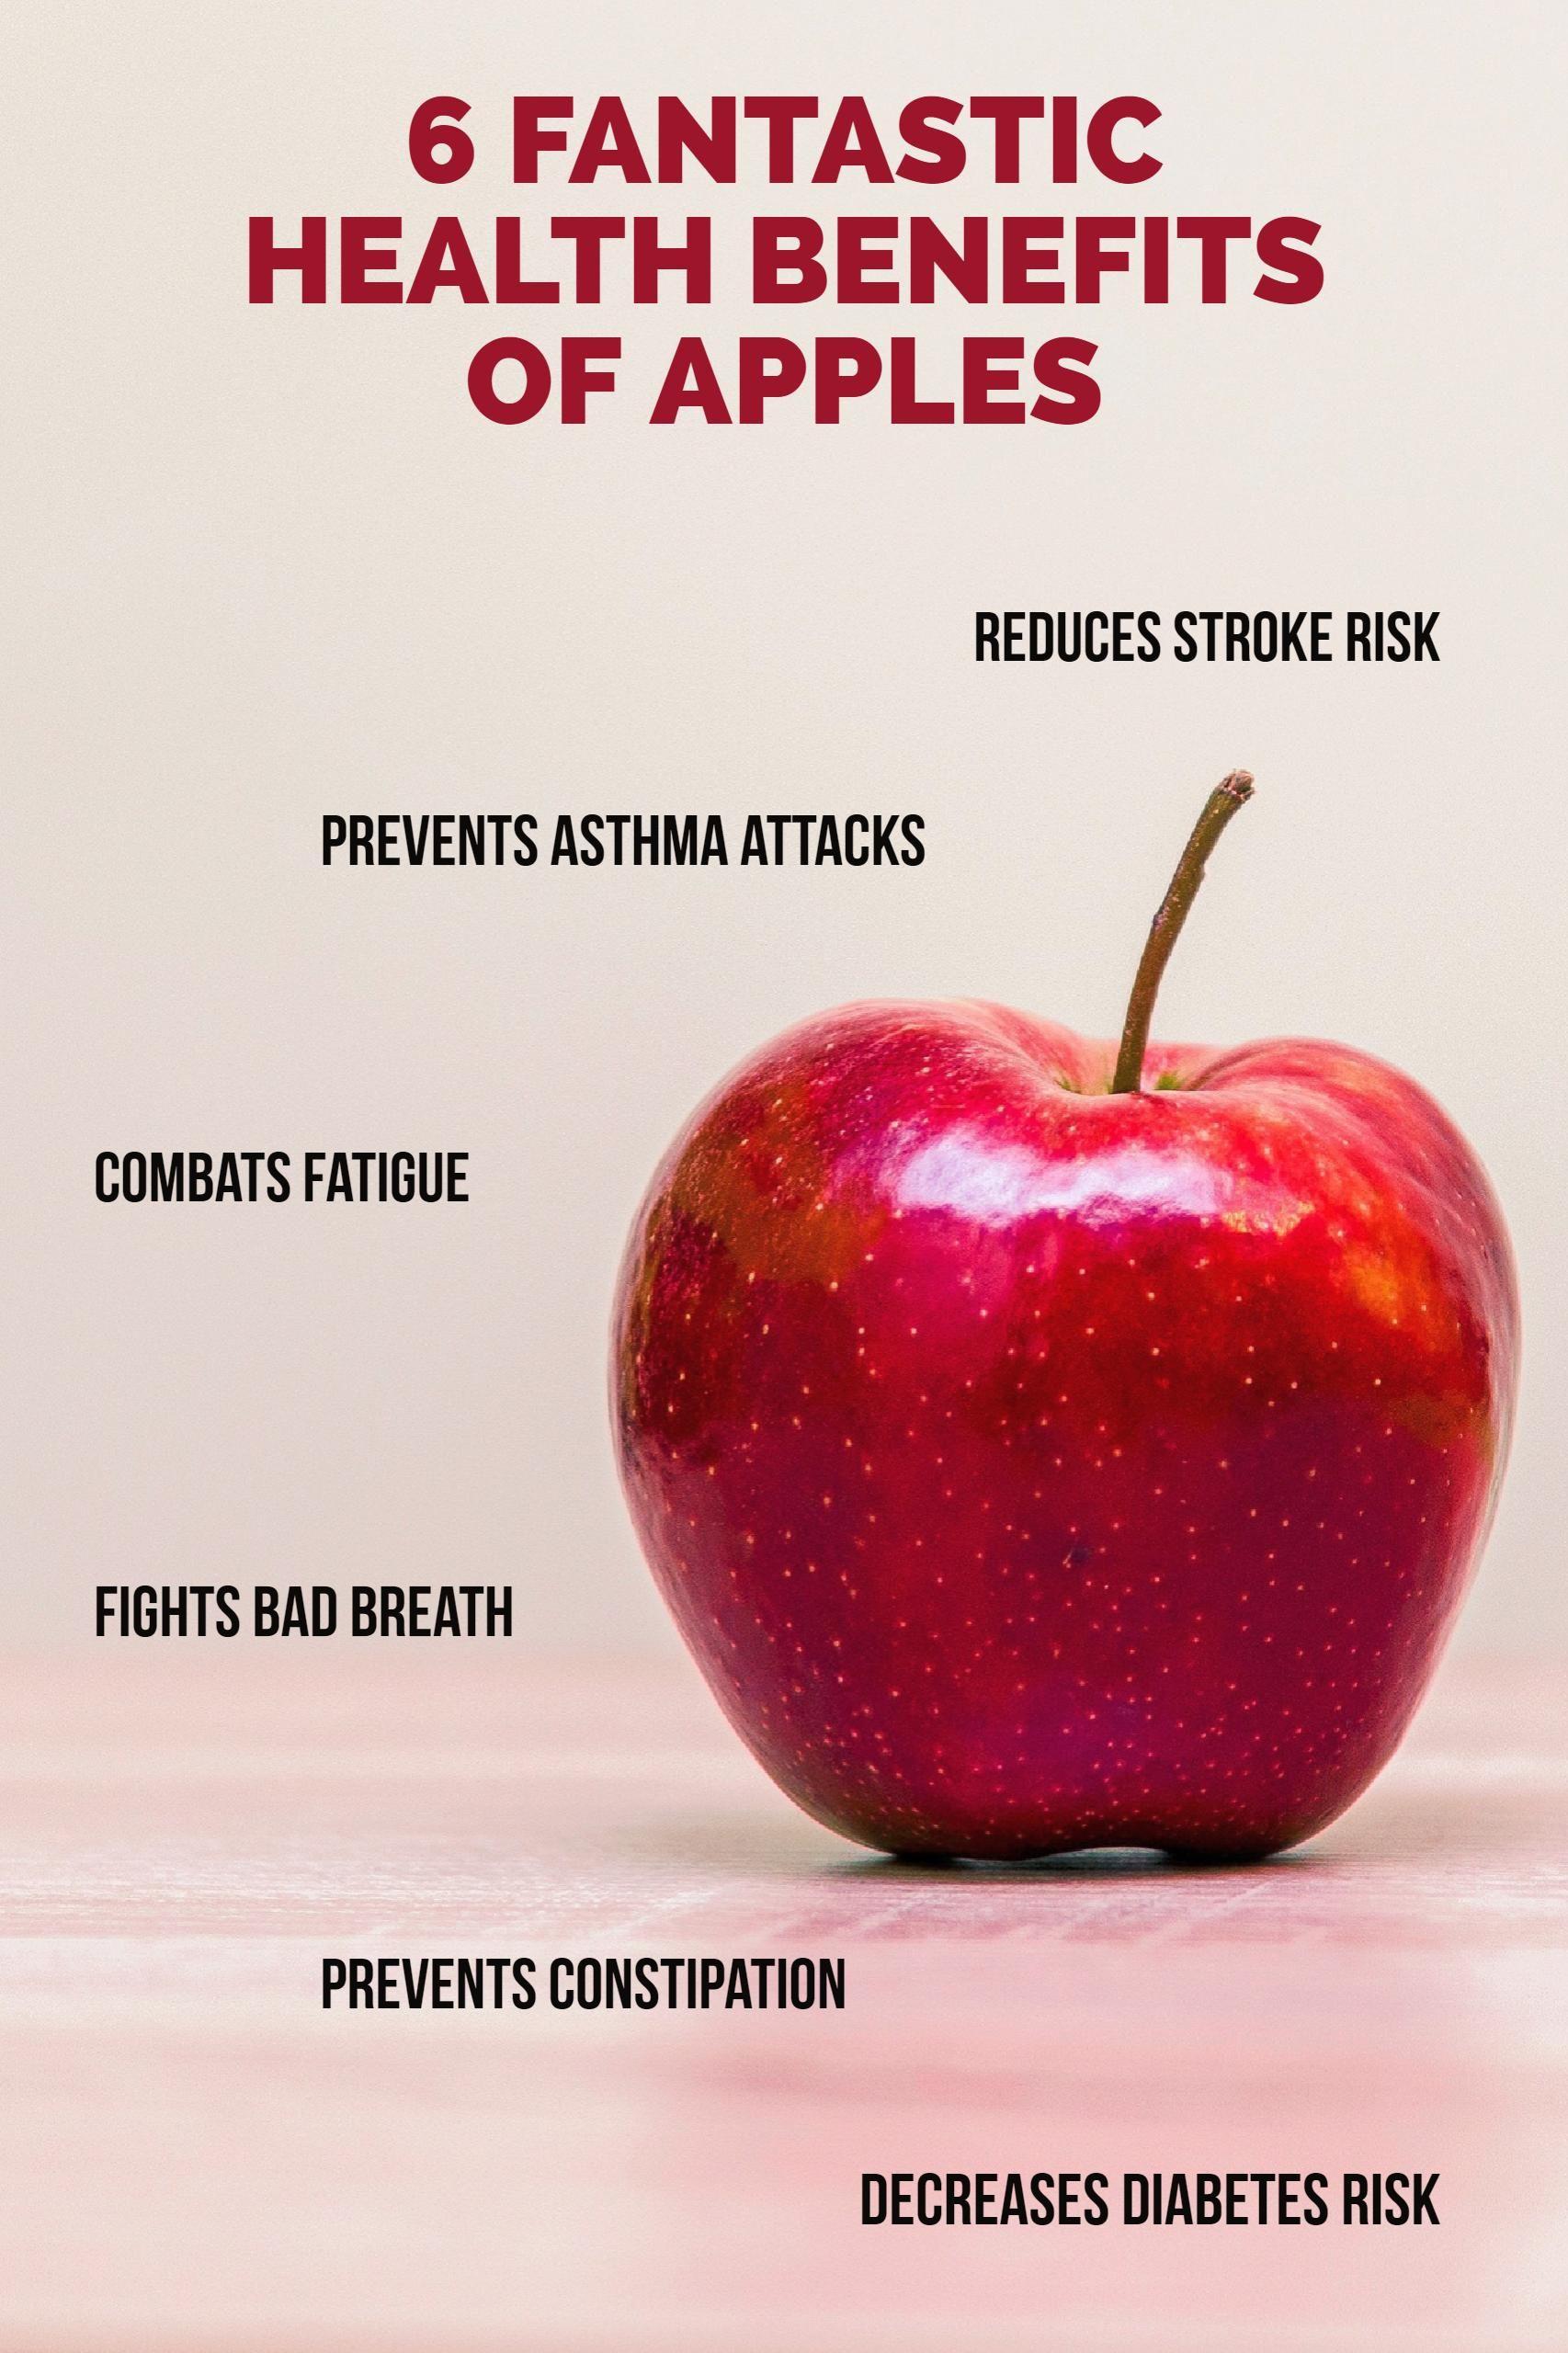 6 Fantastic Health Benefits of Apples